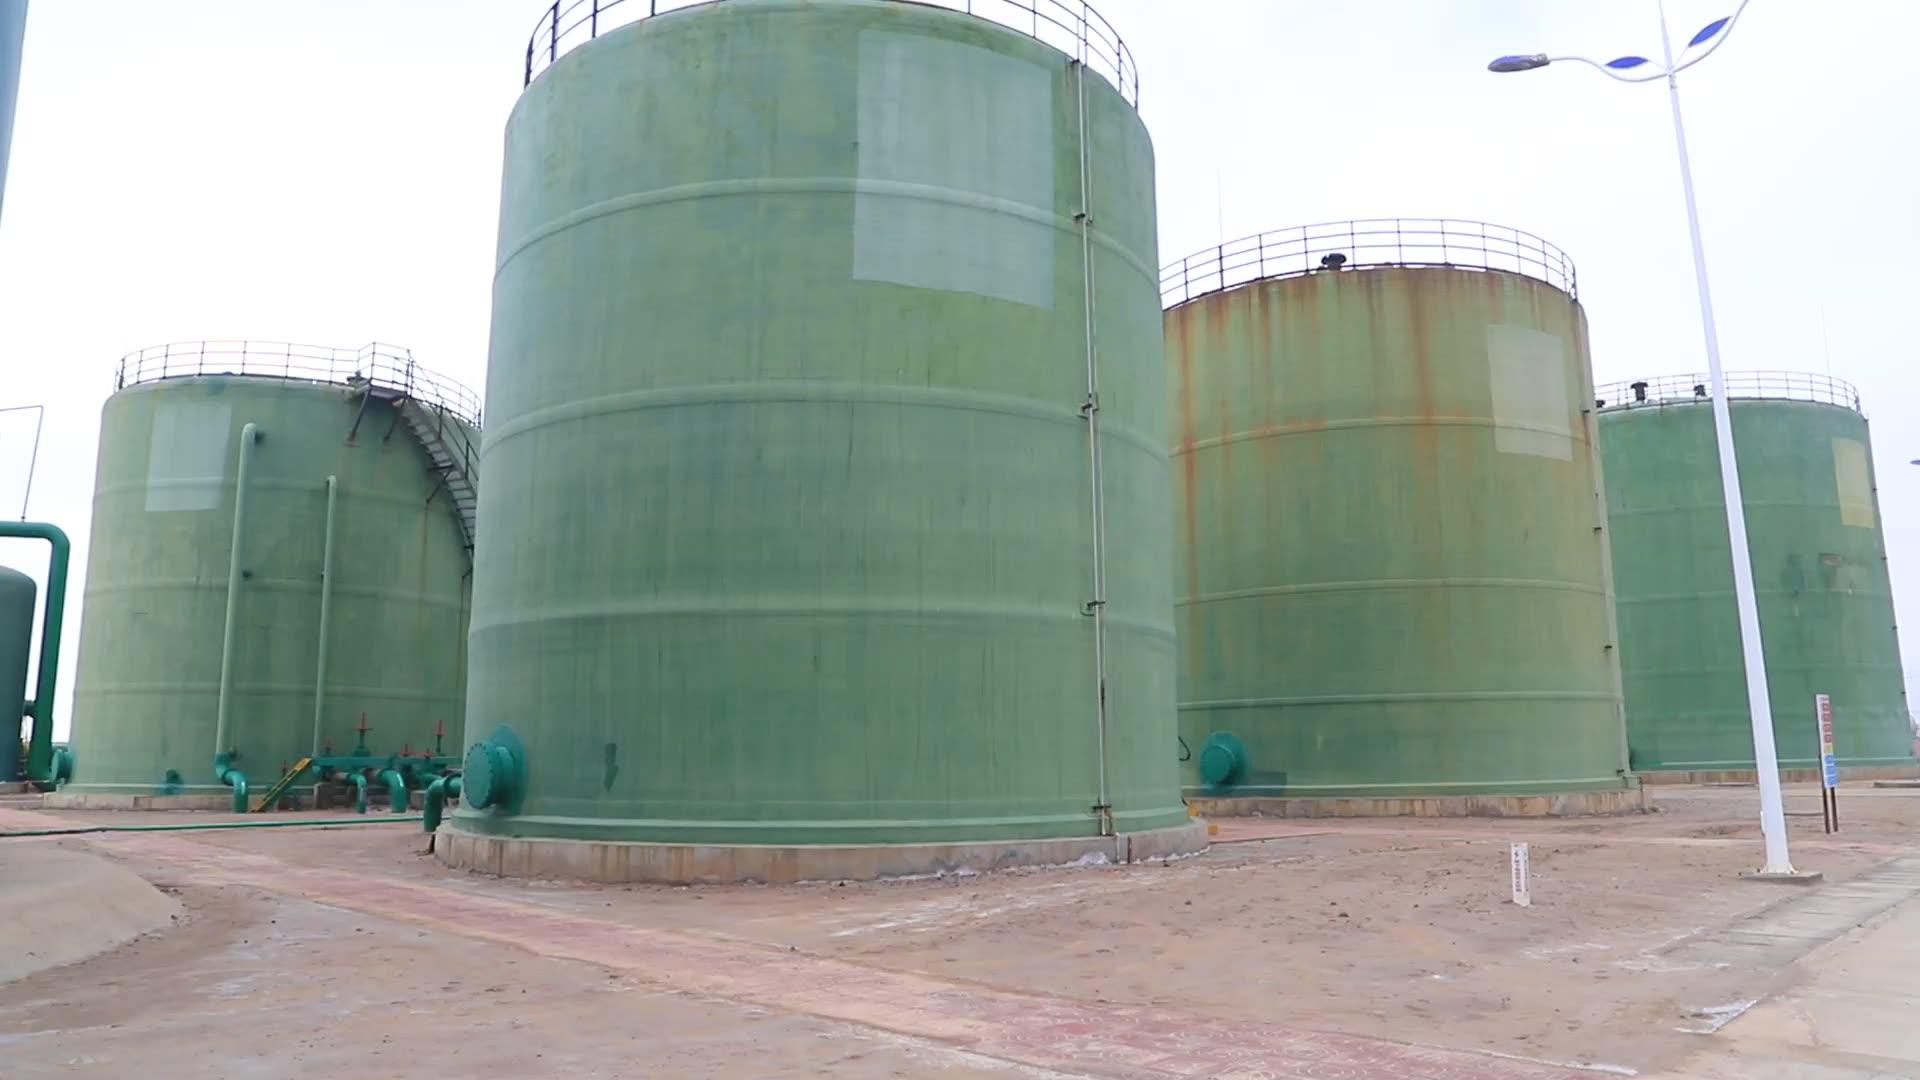 FGS 1006 fiberglass fibre fiber glass FRP GRP GRE  underground potable  petrol petroleum storage tanks for sale